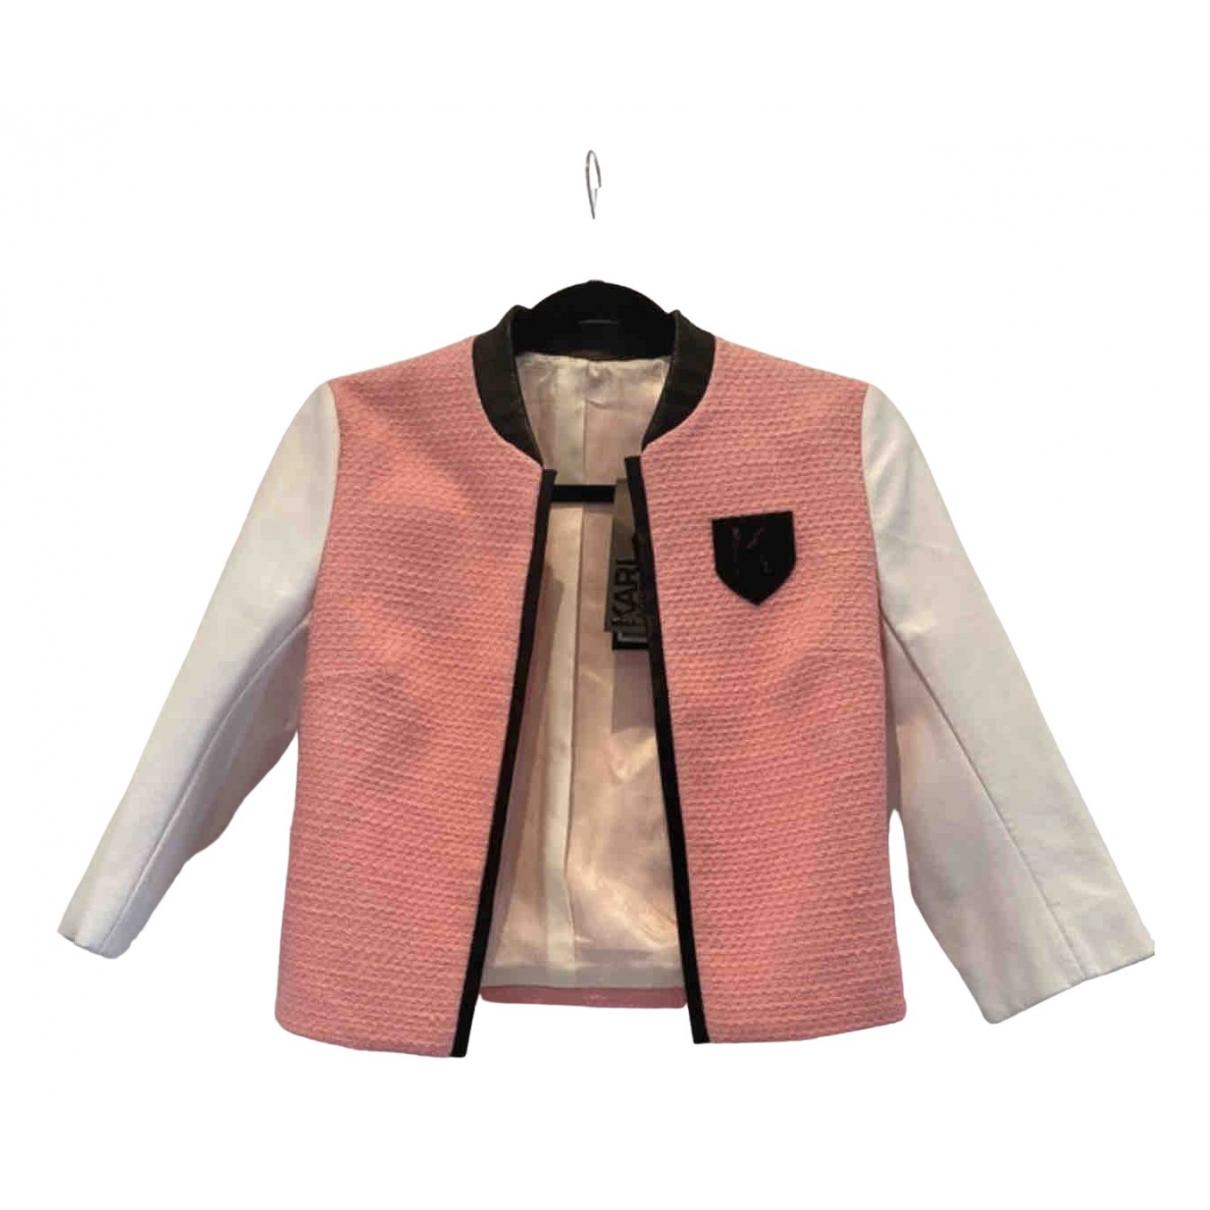 Karl Lagerfeld \N Pink Cotton jacket for Women 36 FR